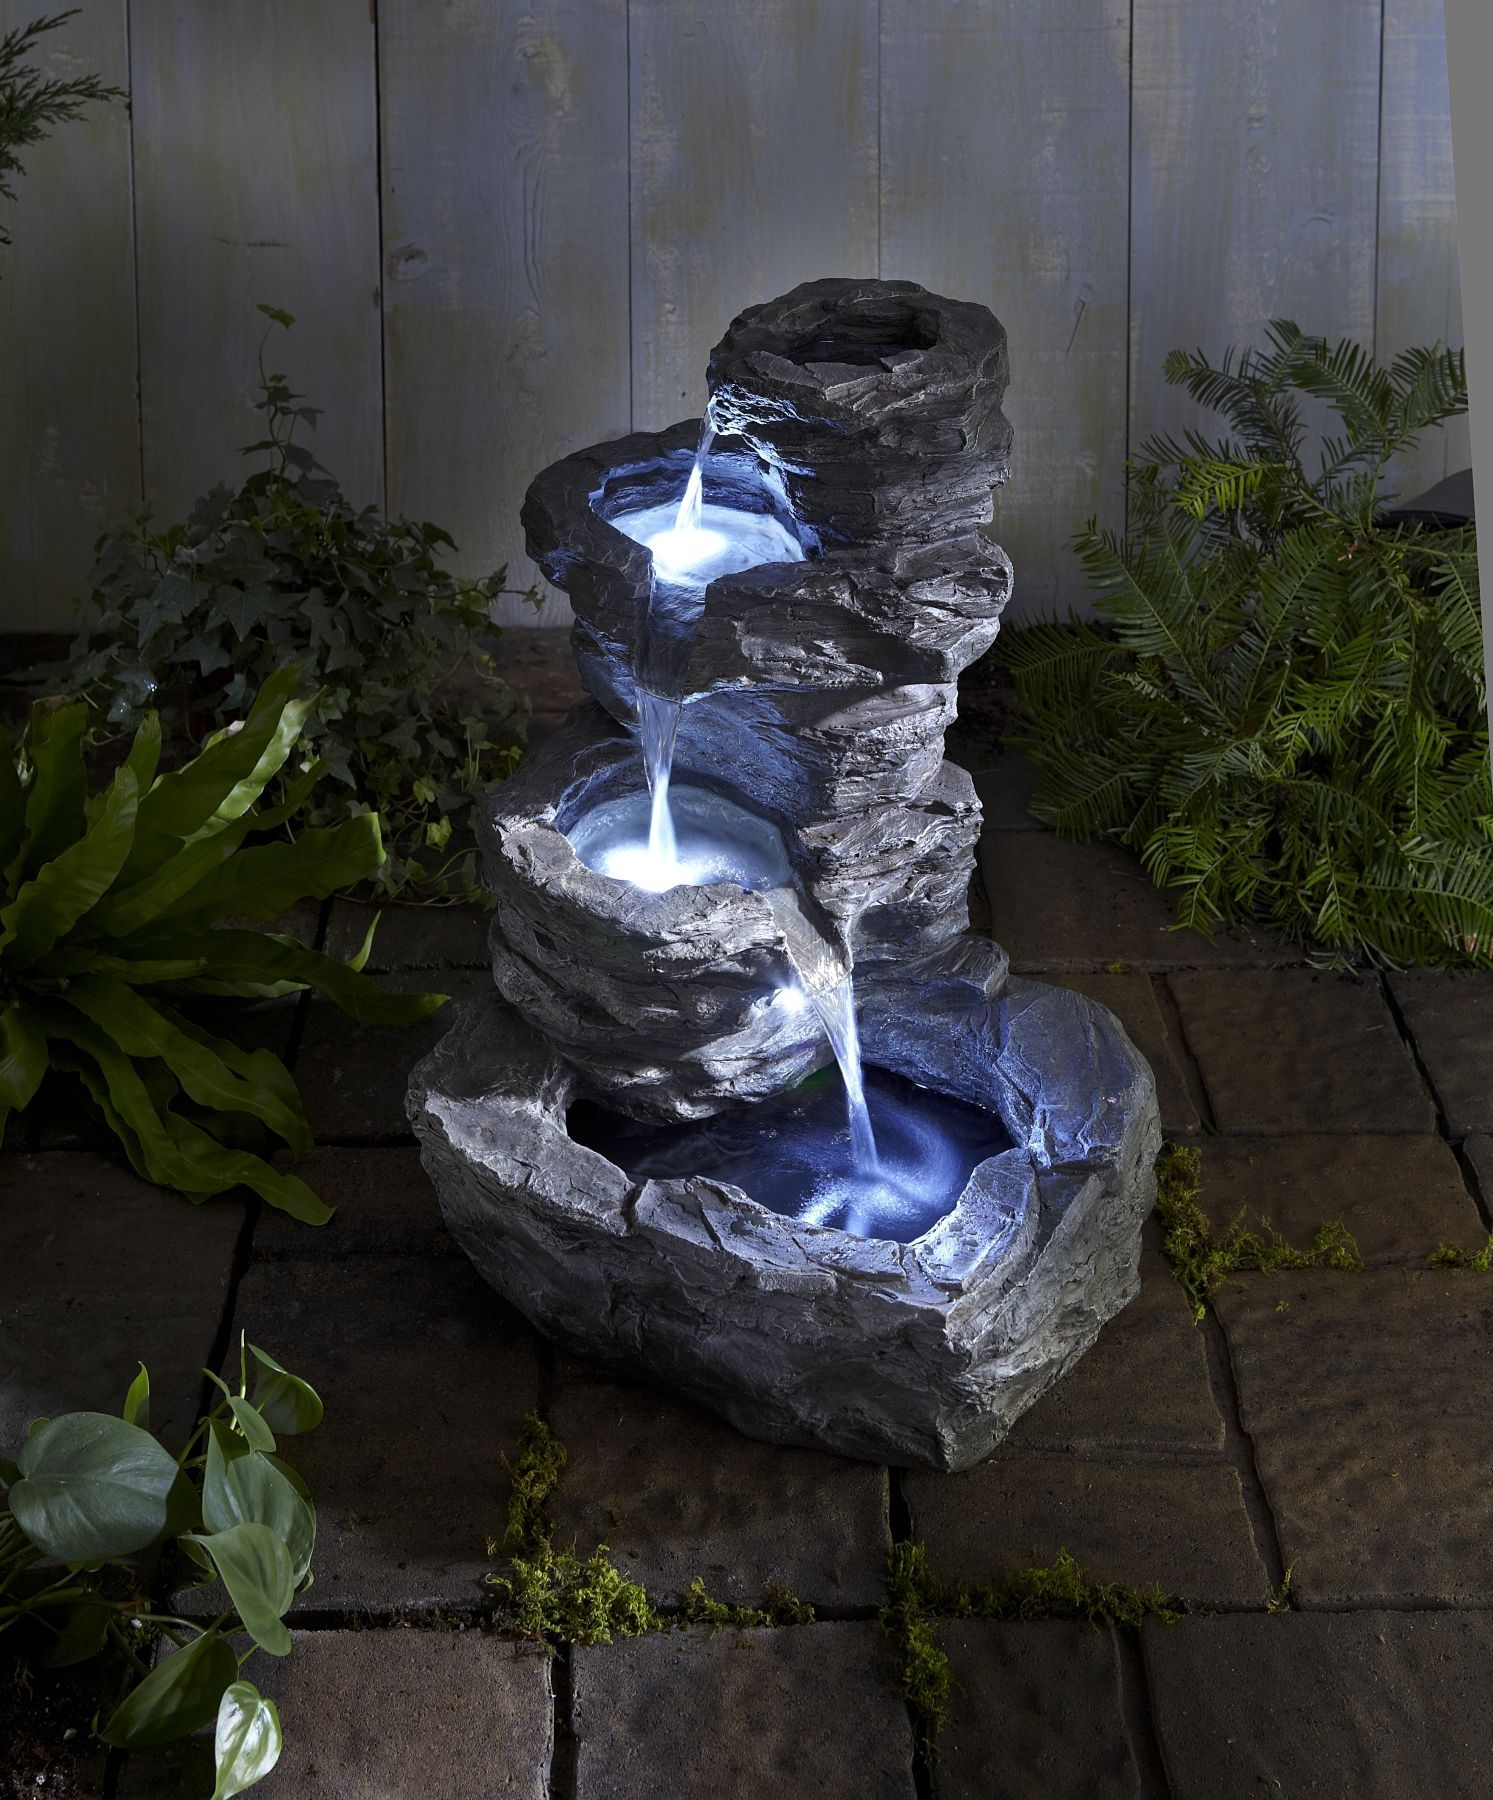 Fuentes de jardin con luces dise o zen fuentes for Cascadas jardin zen